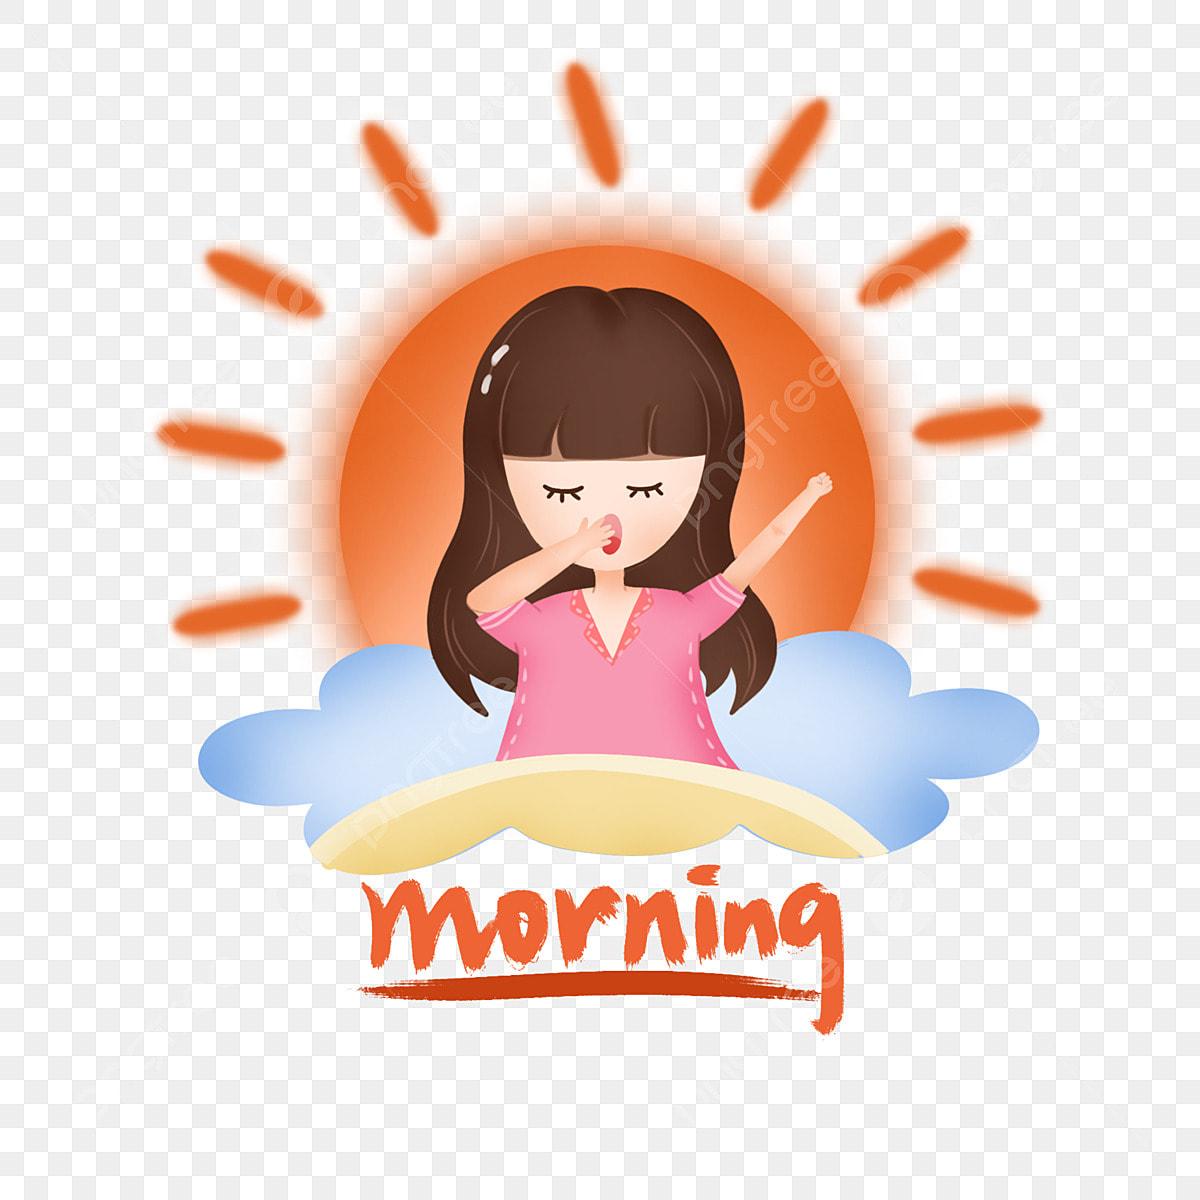 Pagi Matahari Yang Indah Awan Karakter Kartun Awan Kartun